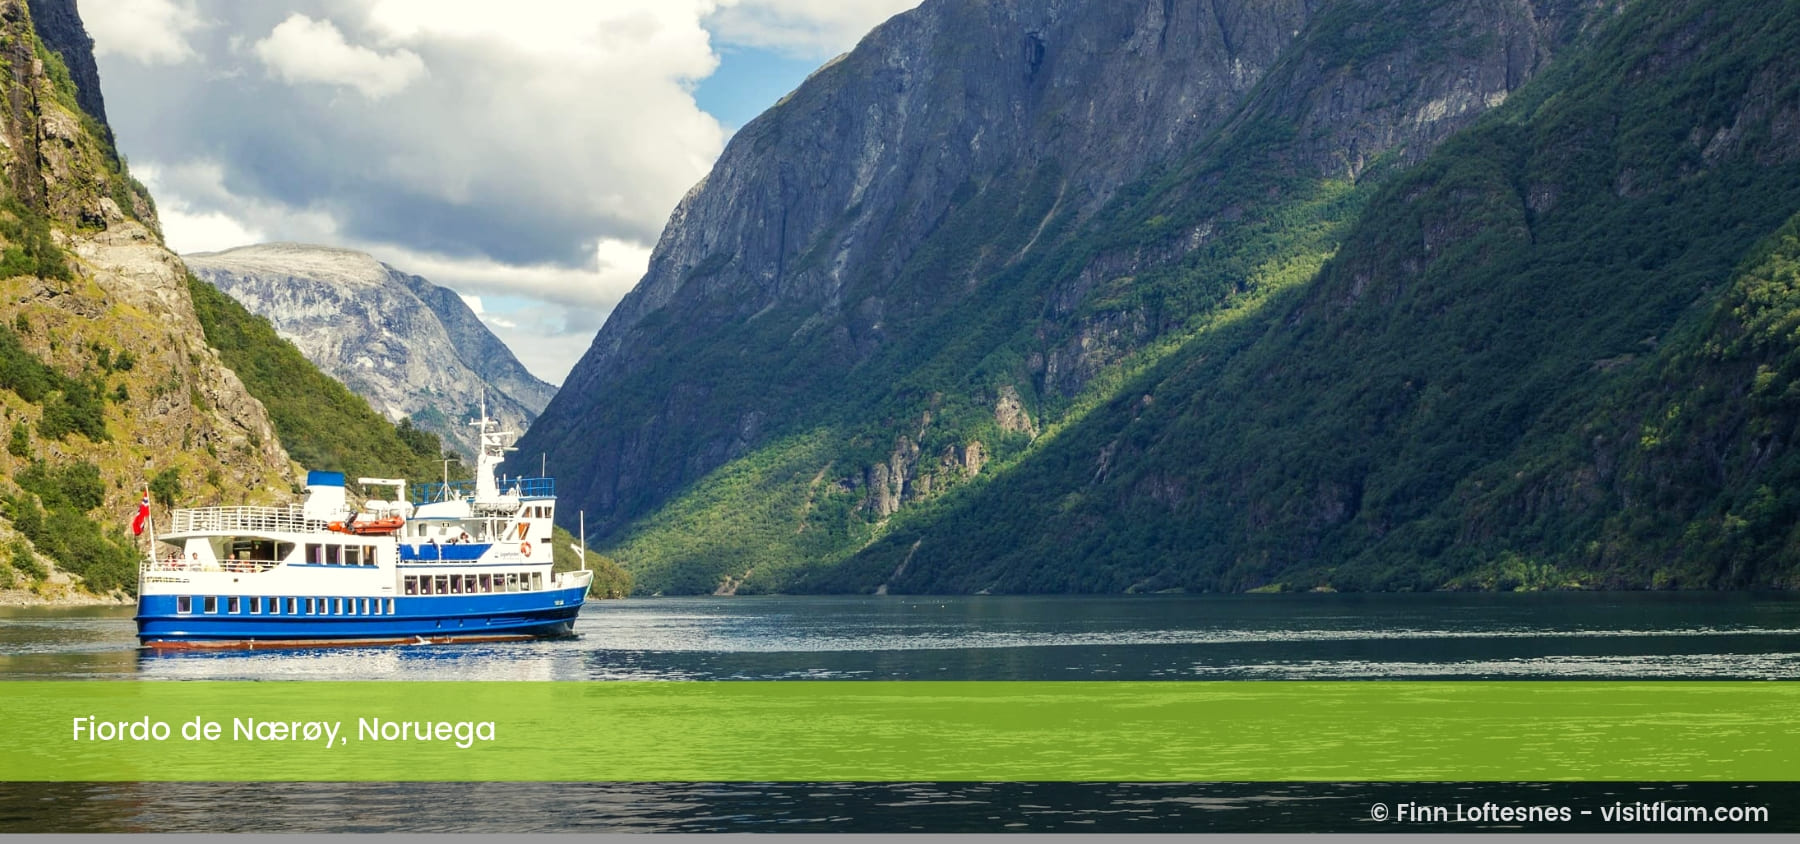 Fiordo de Nærøy Noruega